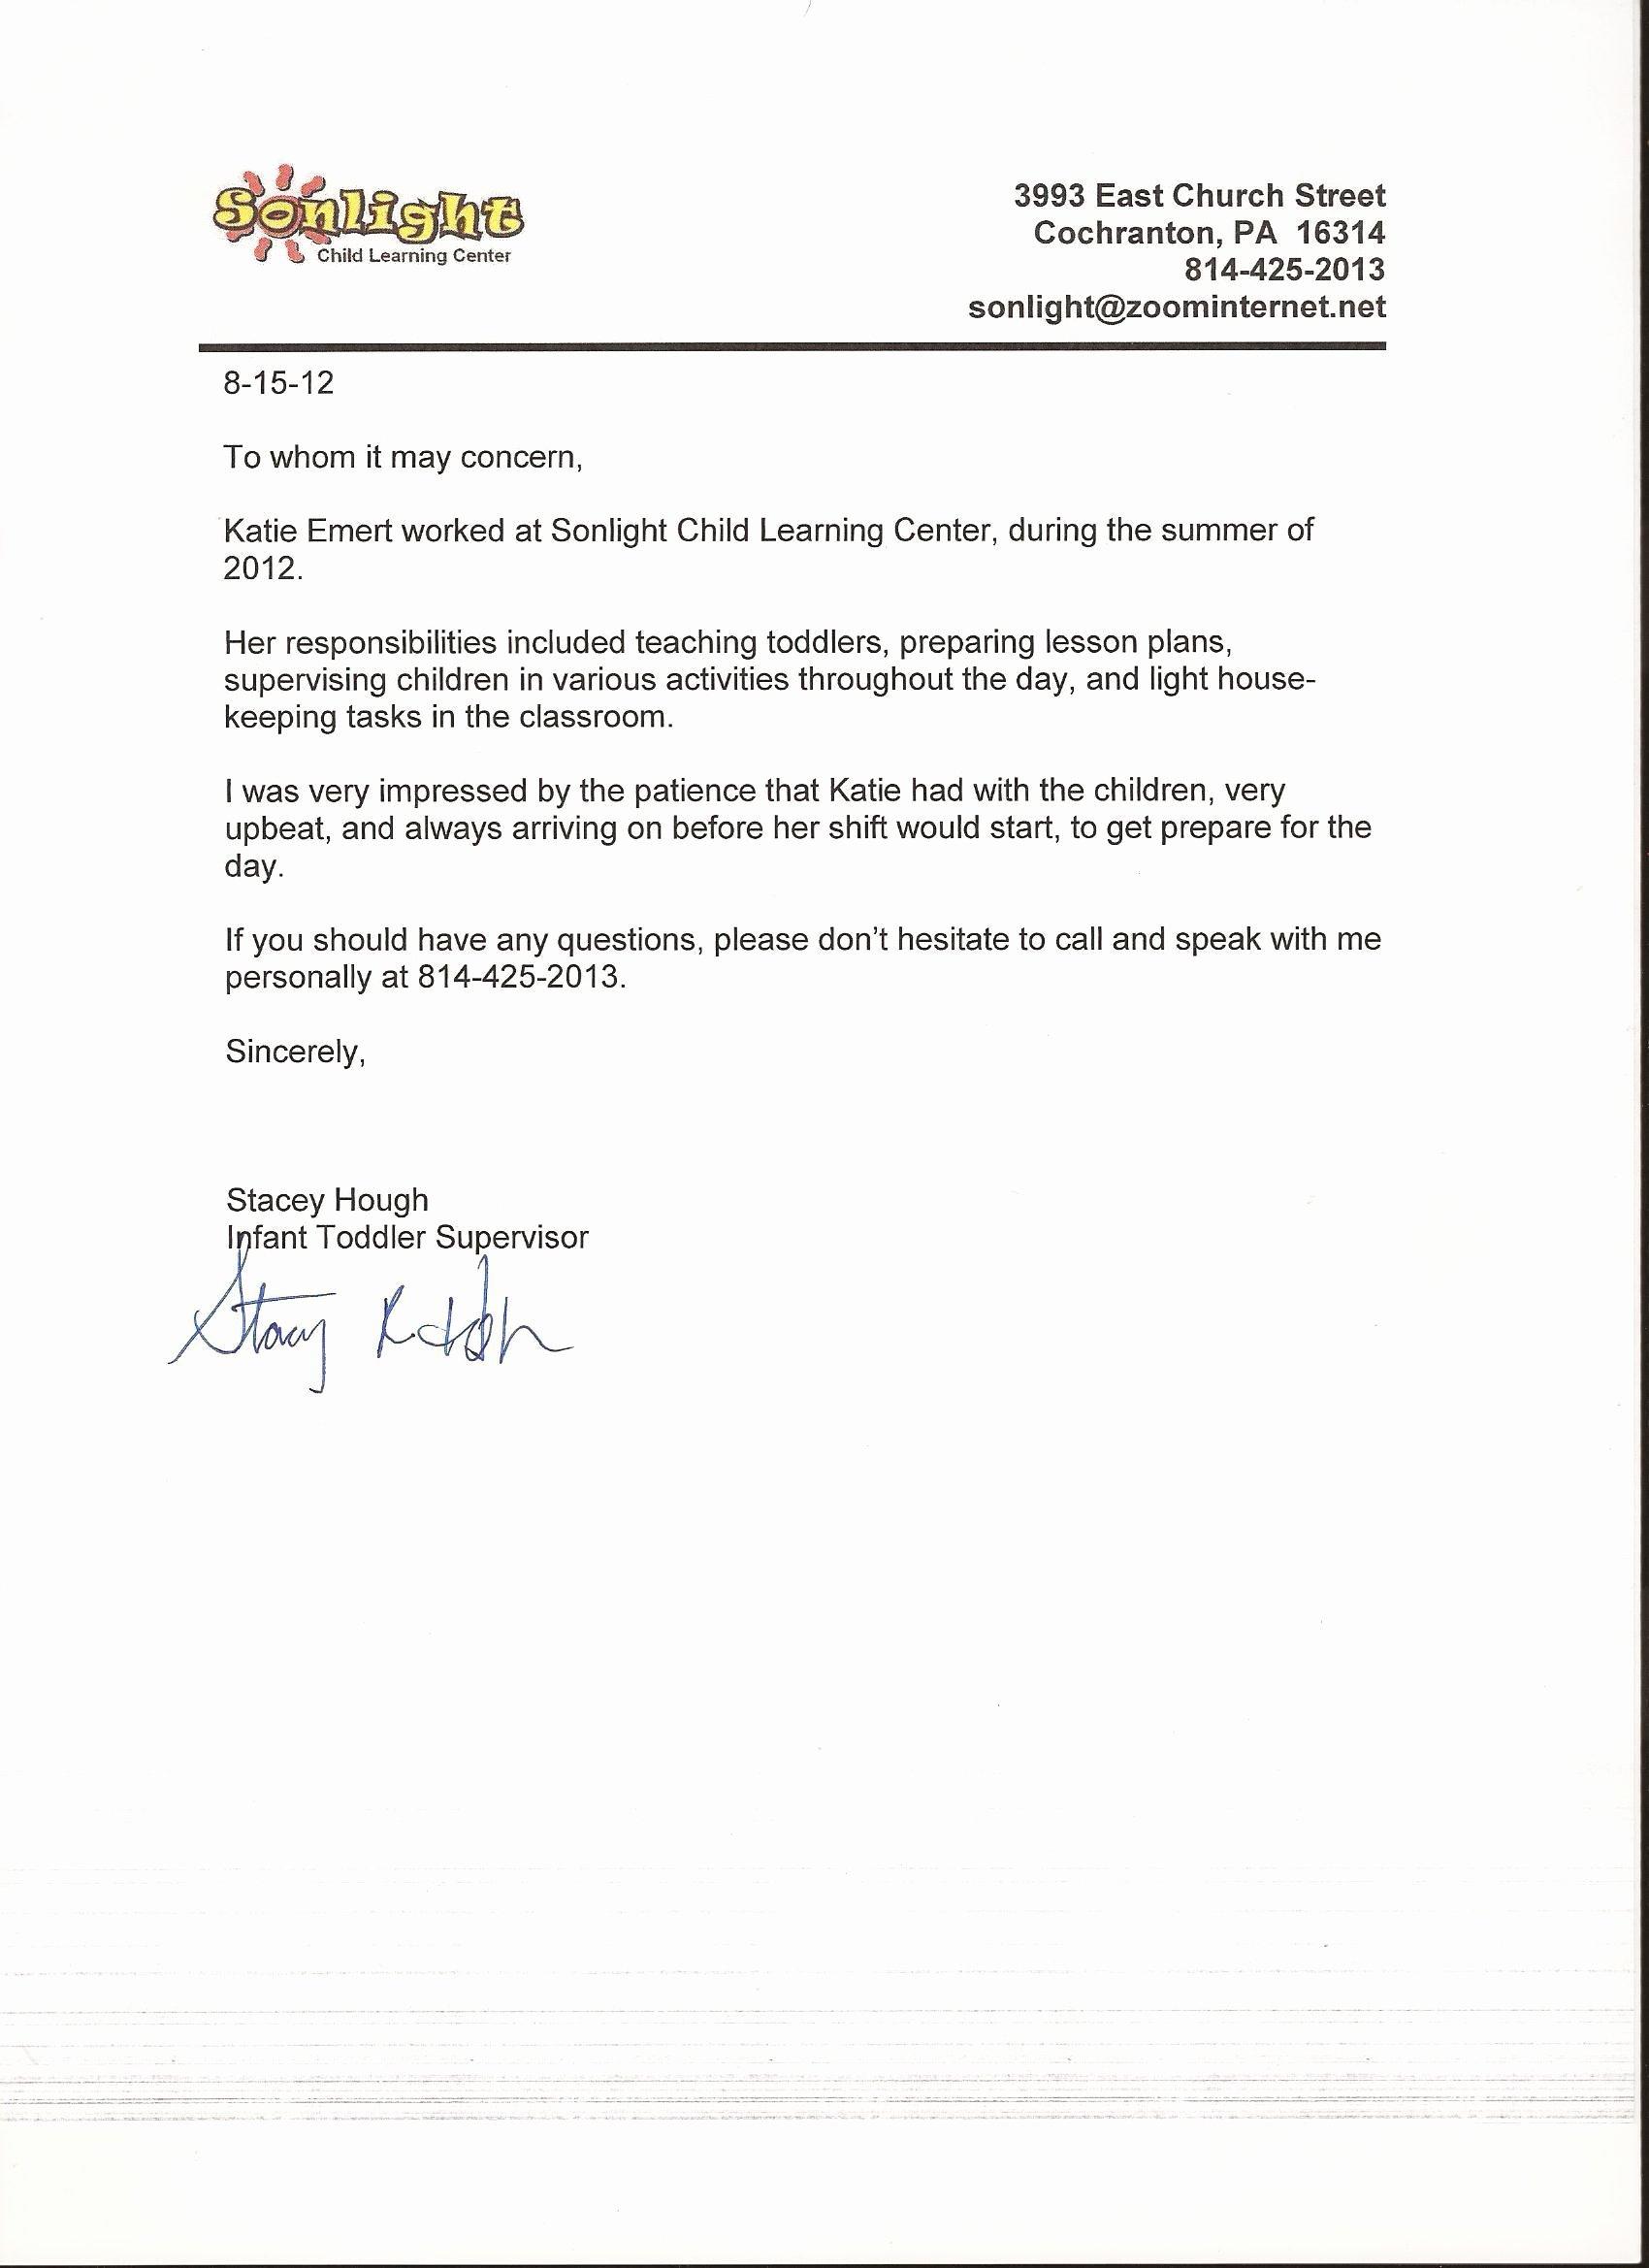 Child Care Letter Of Recommendation Lovely Basic Letters Re Mendation Sample Reference Letter